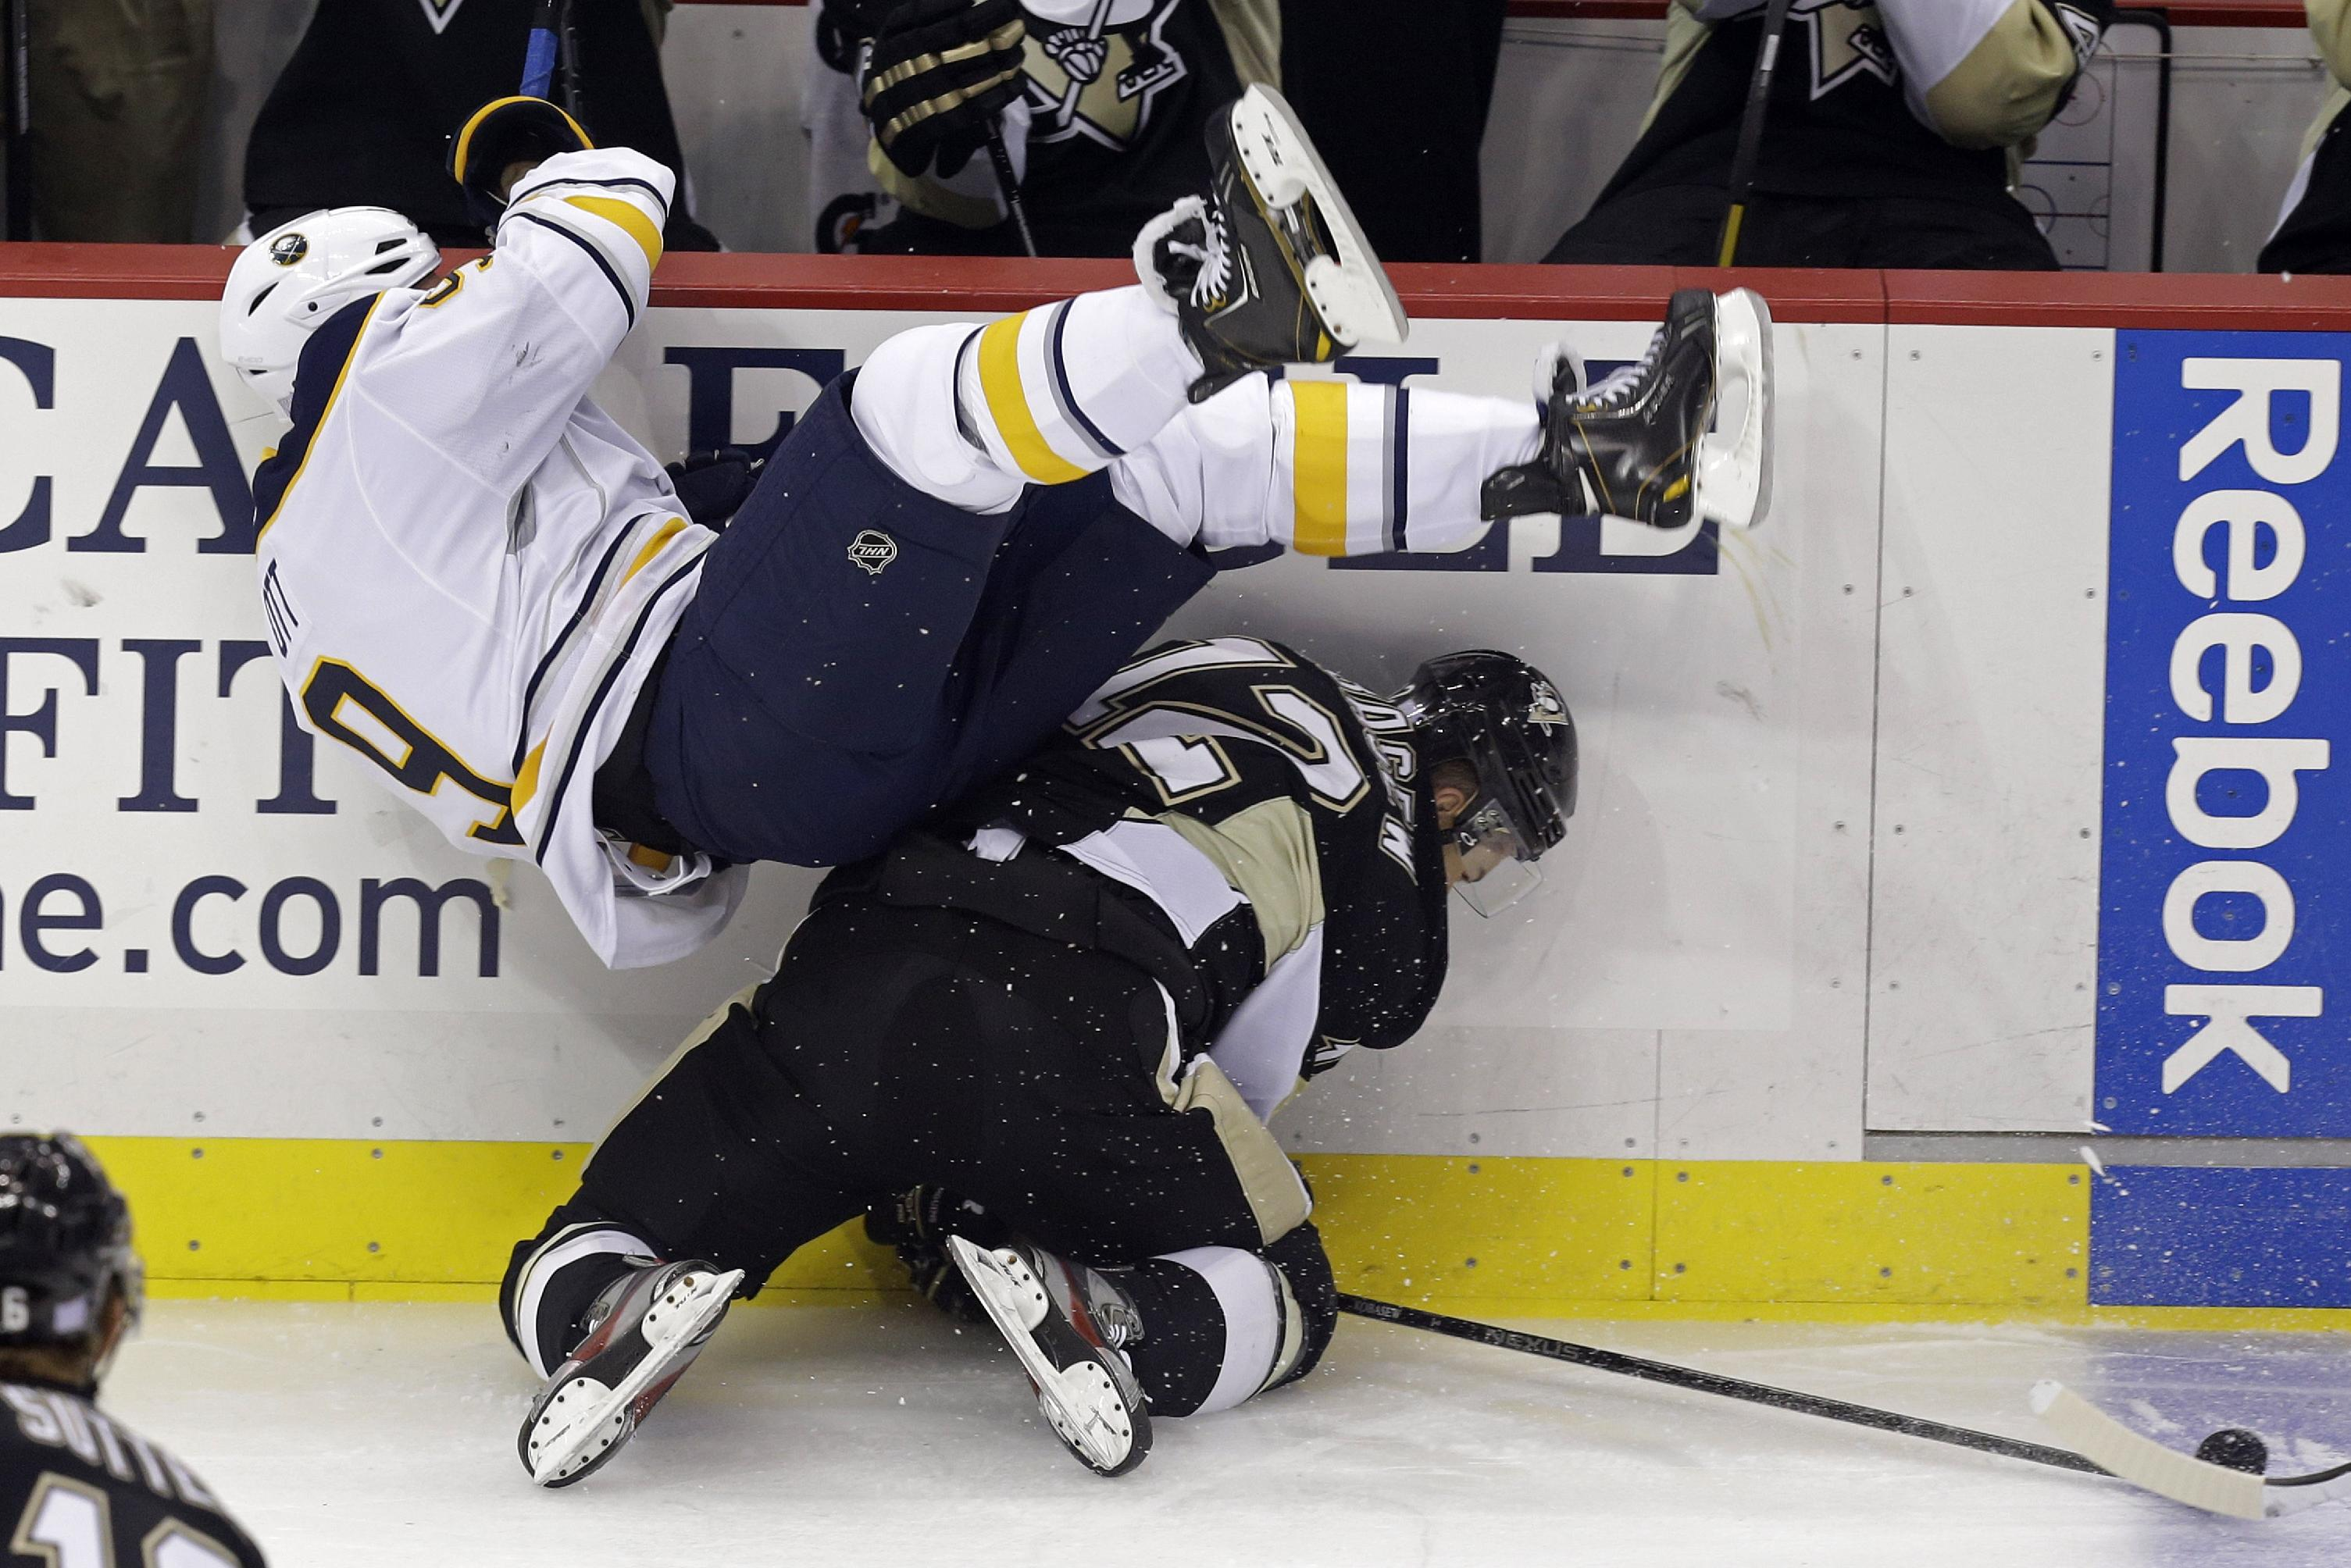 Crosby, Fleury lead Penguins past Sabres 4-1